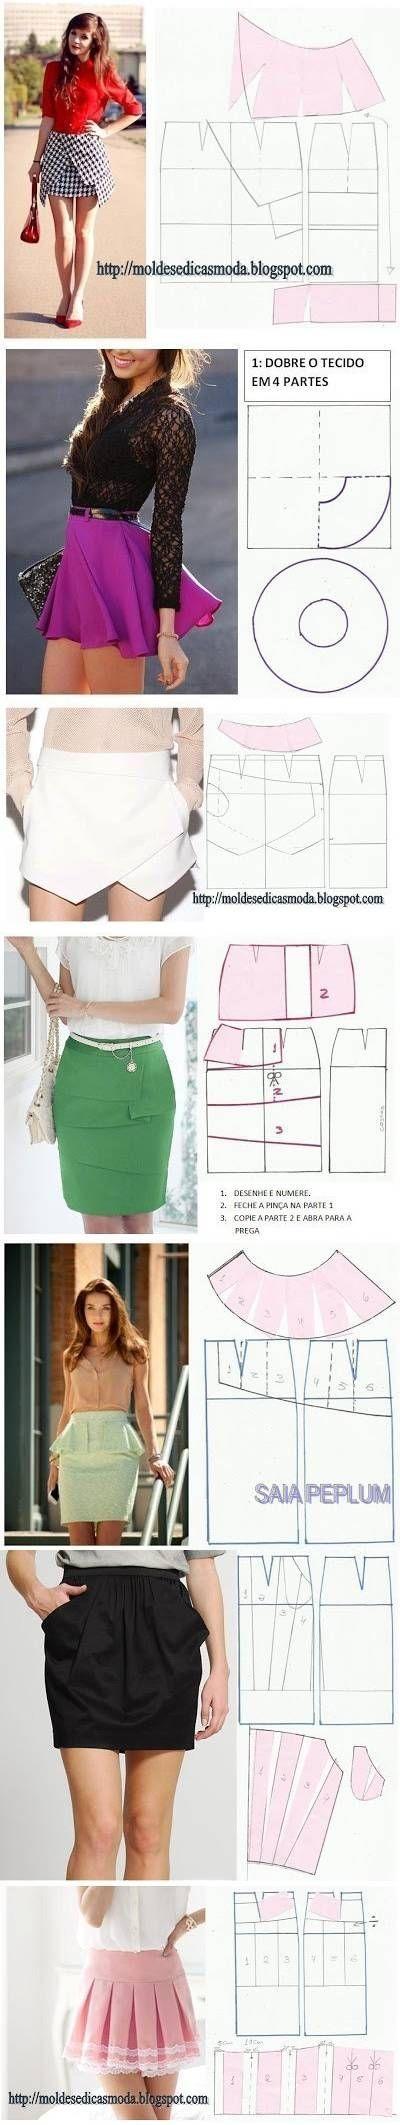 DIY Stylish Skirts crafts craft ideas easy crafts diy ideas diy crafts diy…